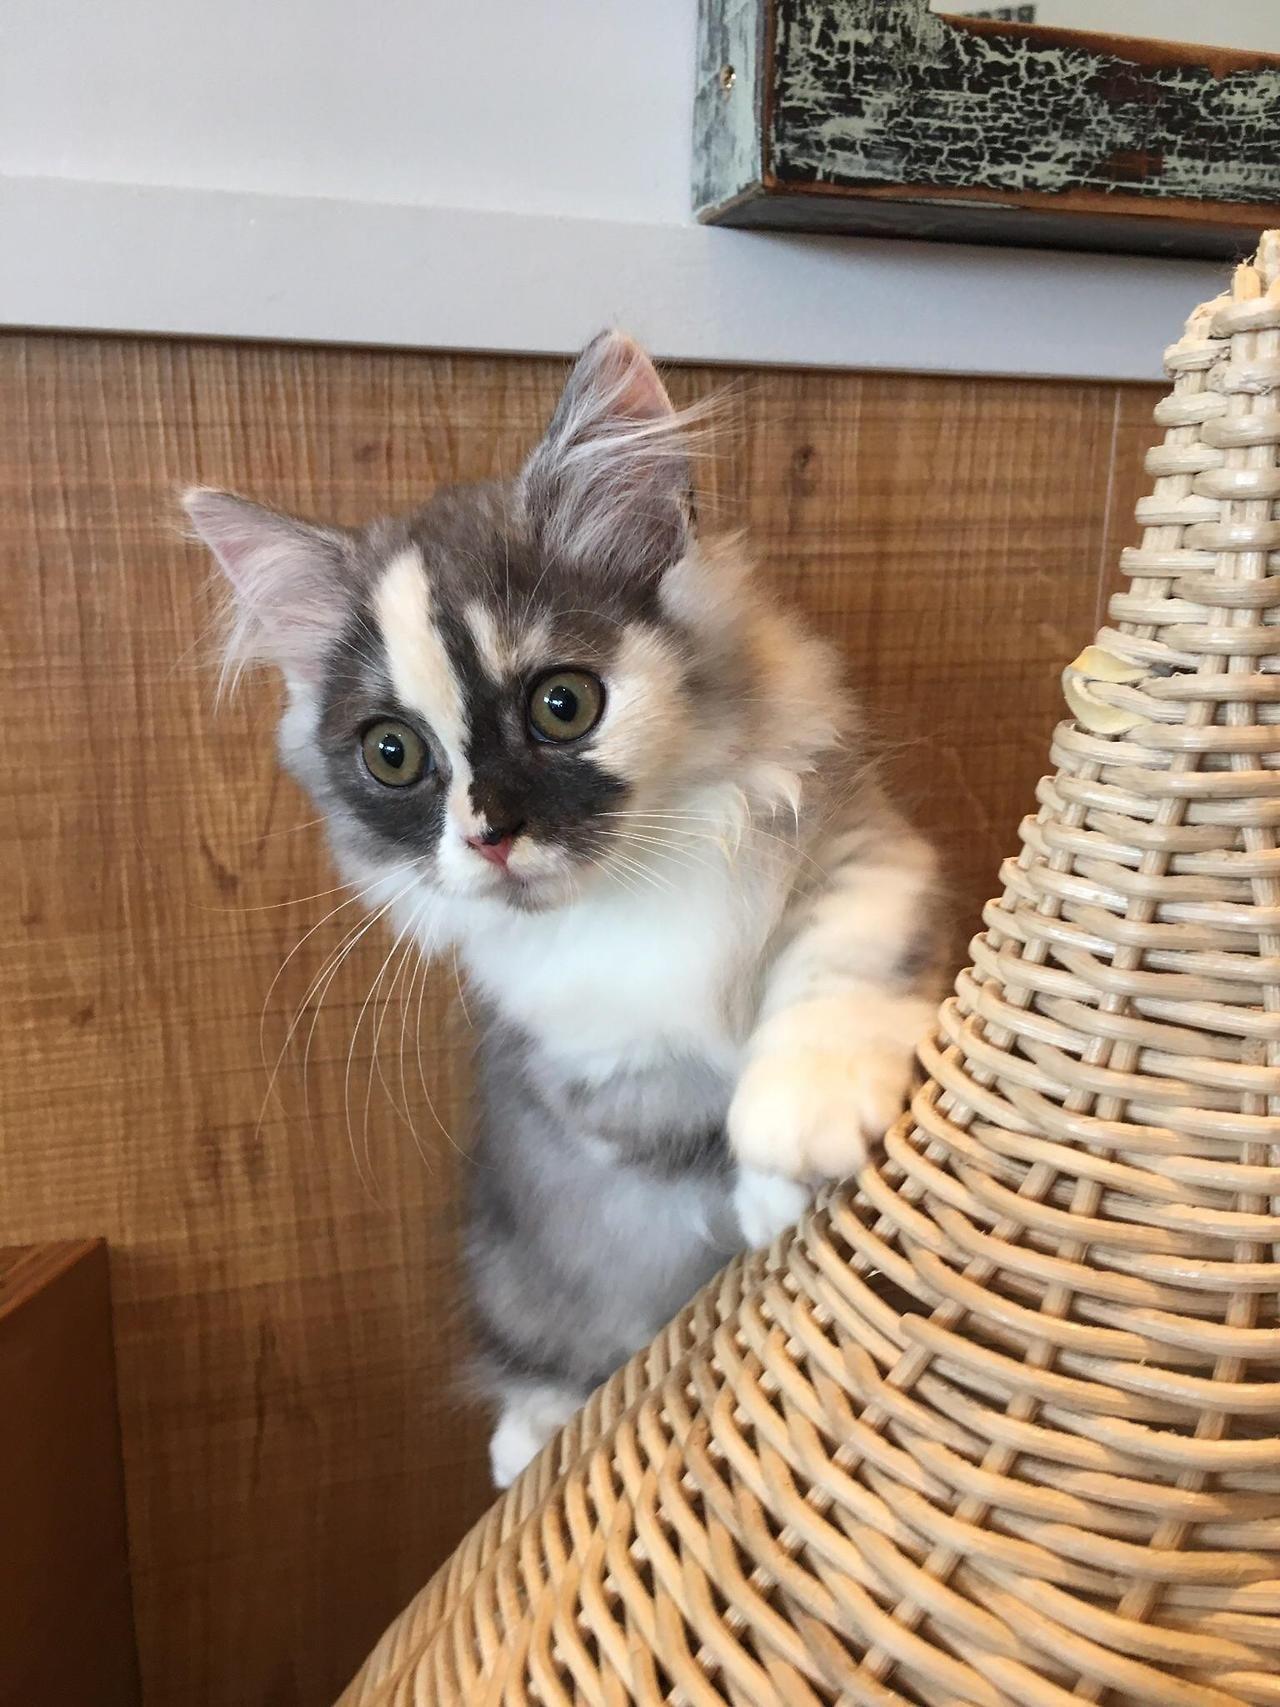 Cats Center Dwarf kittens, Cats, Tiny cats